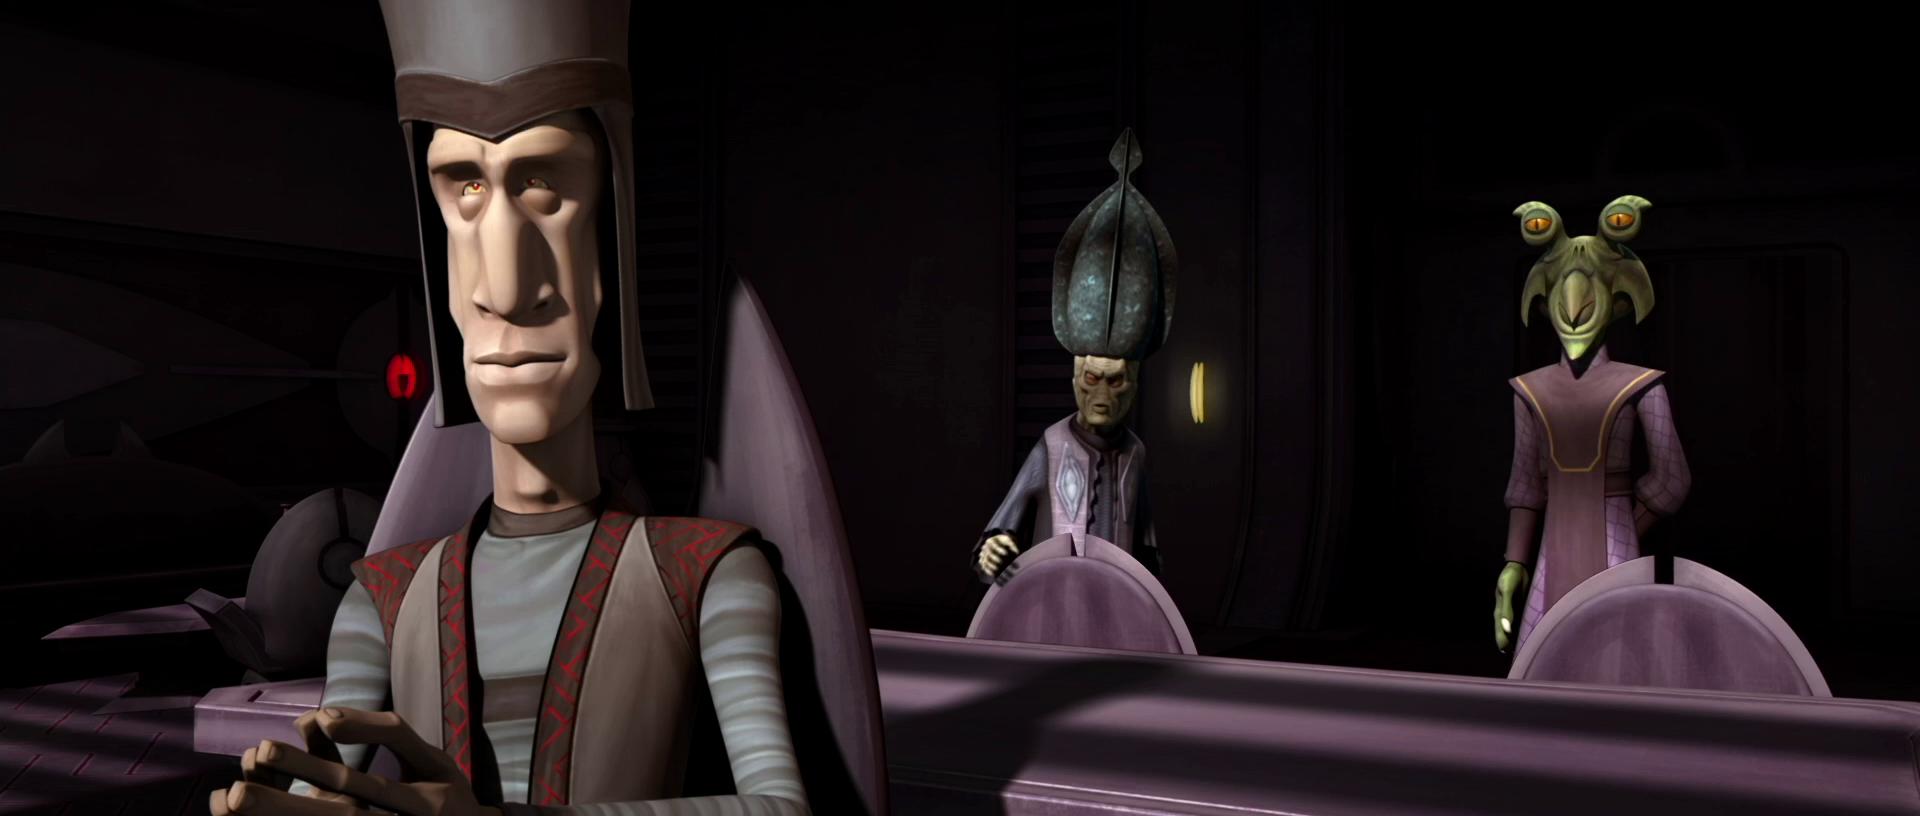 What's missing? Star Wars: The Clone Wars | Brickset: LEGO